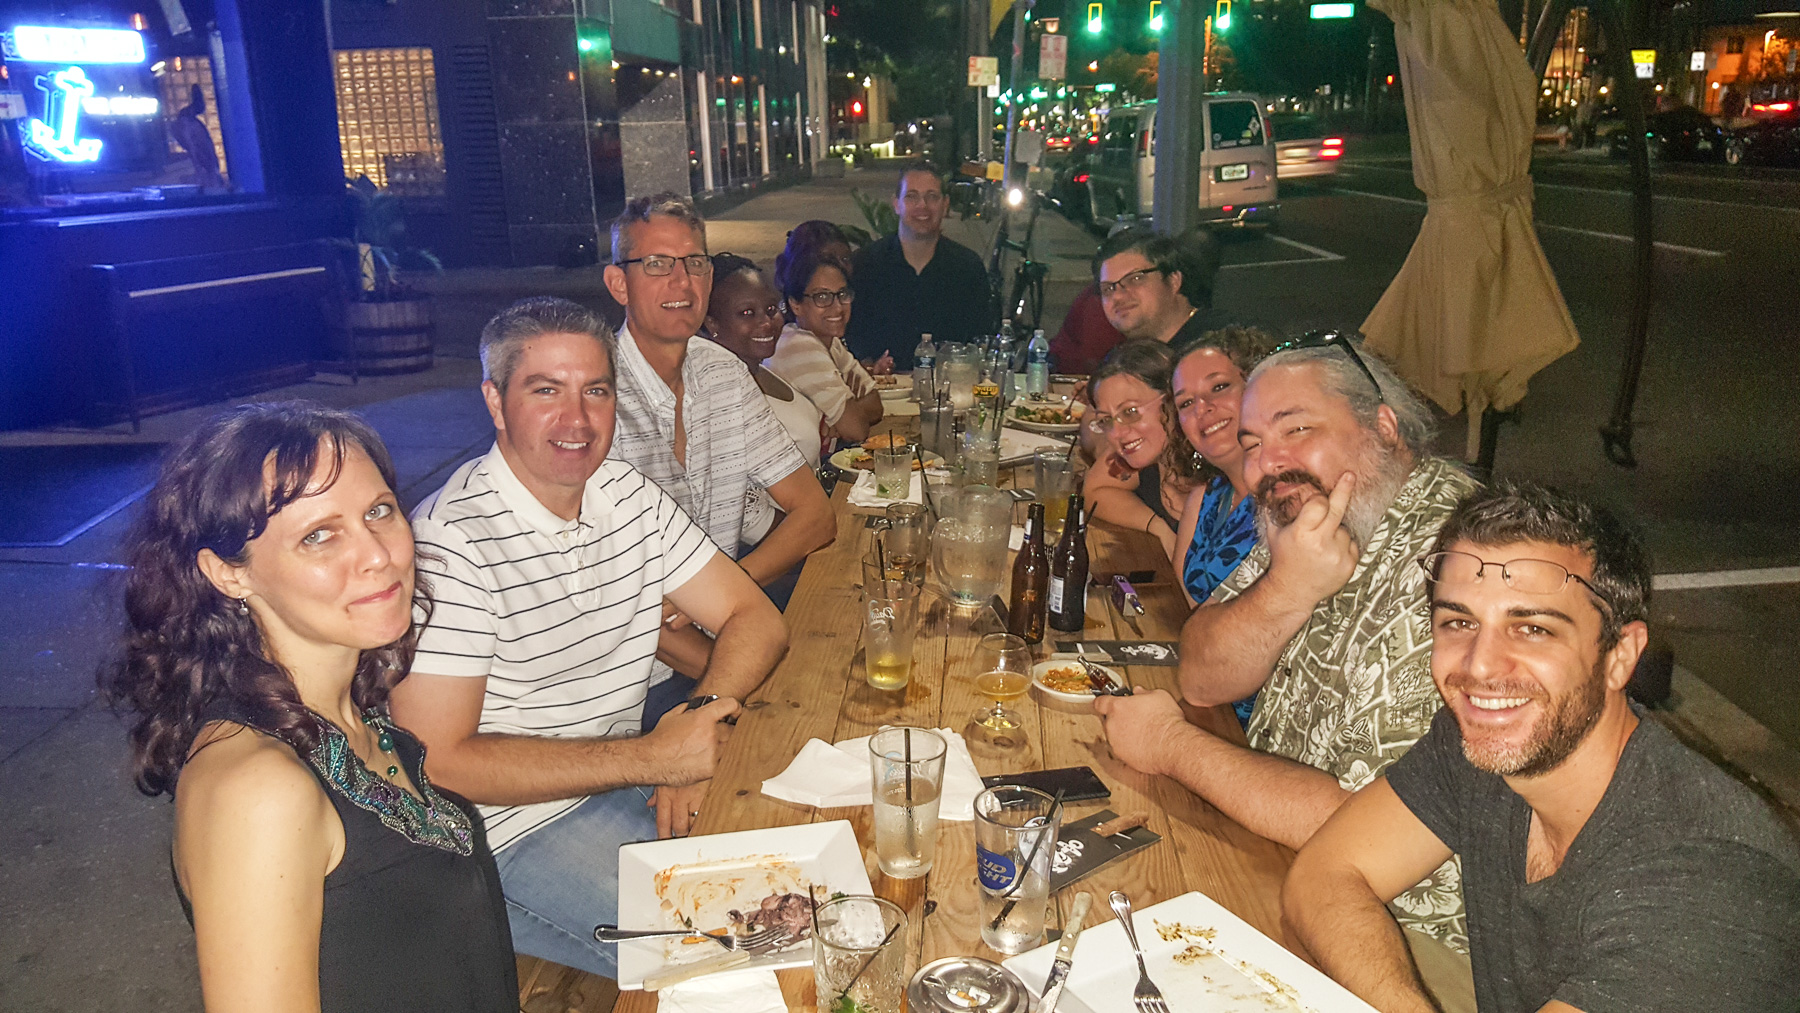 2017 03-30 esc-at-dtsp-restaurant-the-galley-12